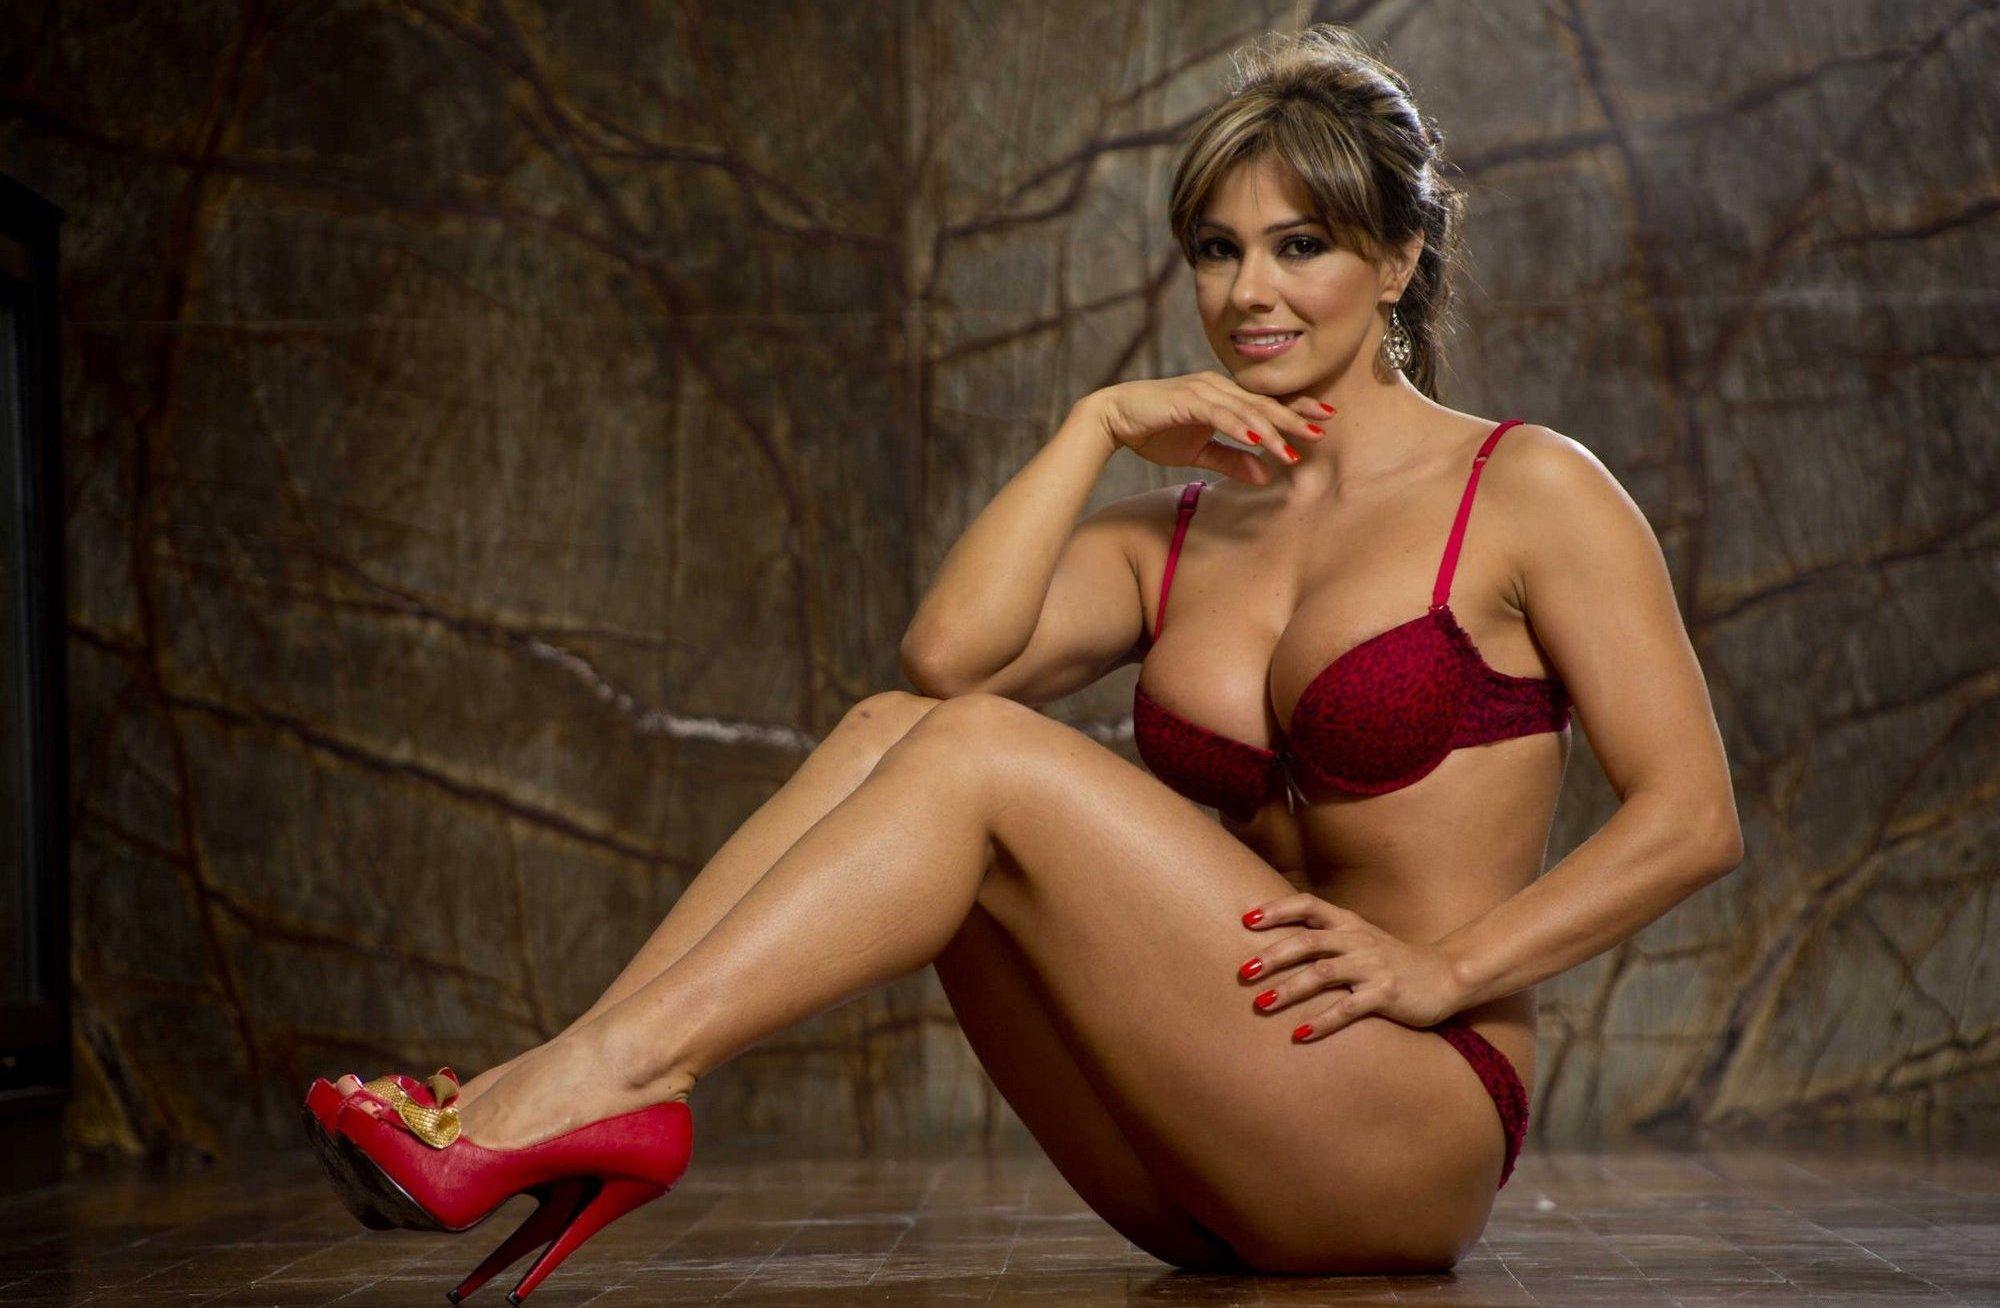 Sexy MILF Evie Delatossa stays in lingerie for a hardcore fuck № 459225  скачать